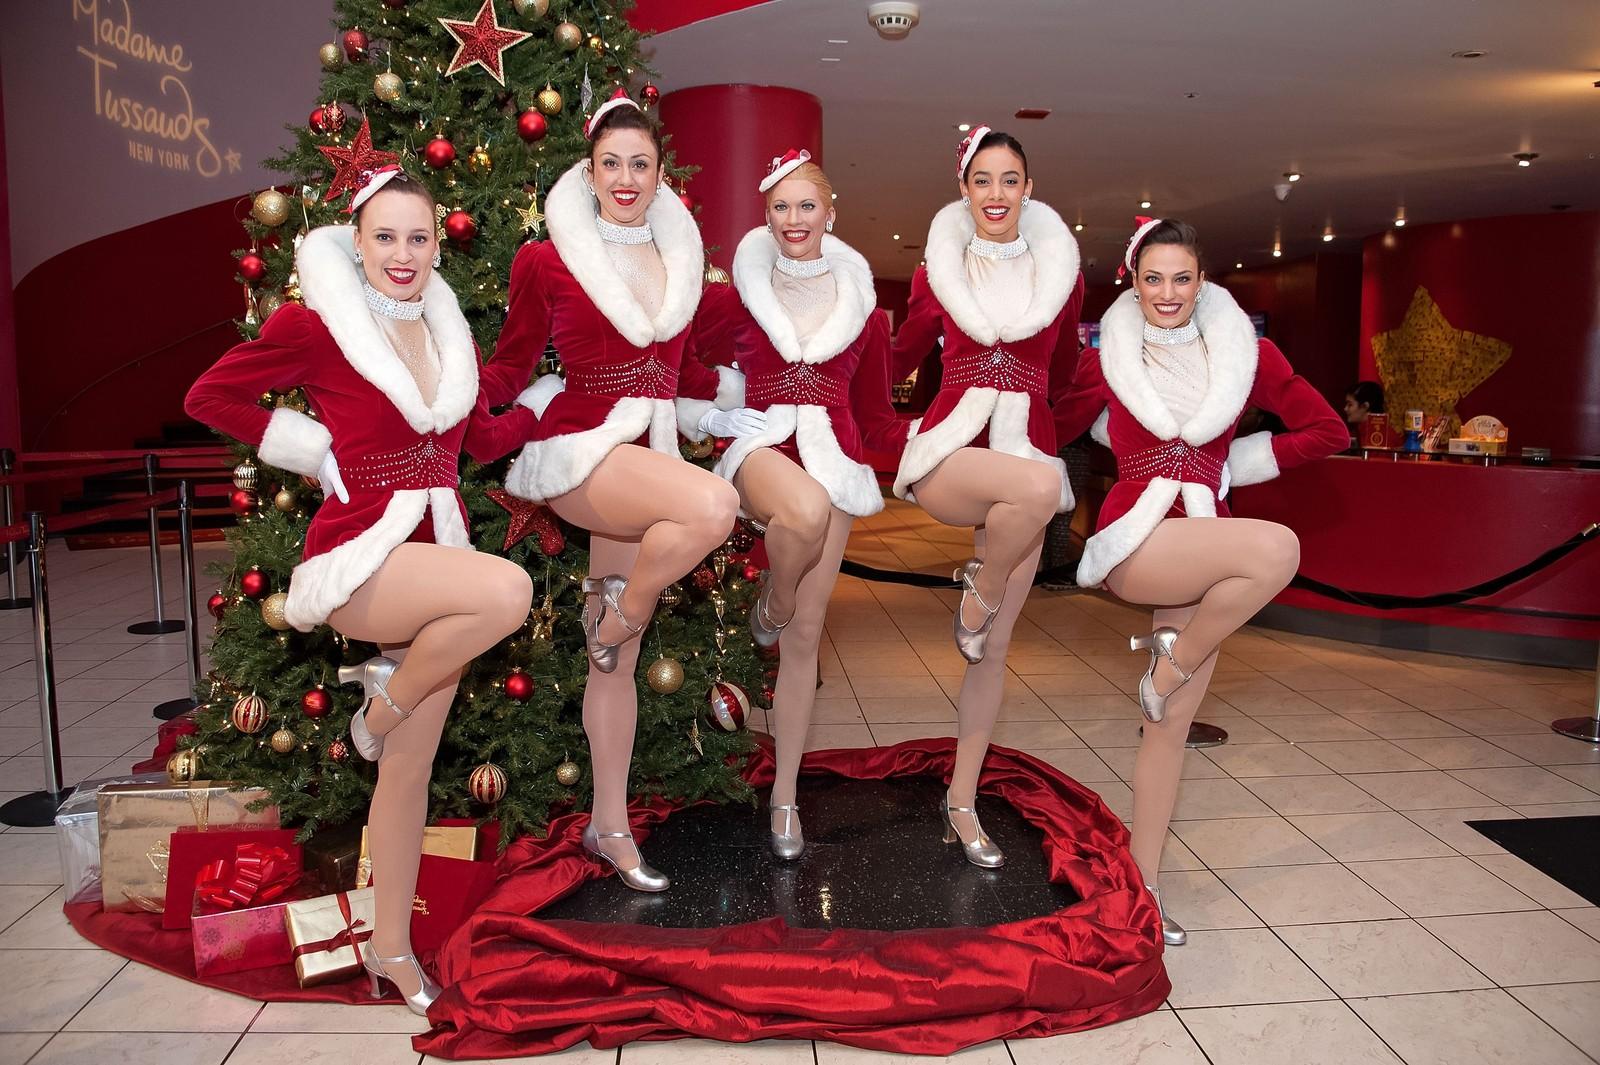 De verdenskjente Radio City Rockettes poserer på Madame Tussauds vokskabinett med en ny voksdukke.